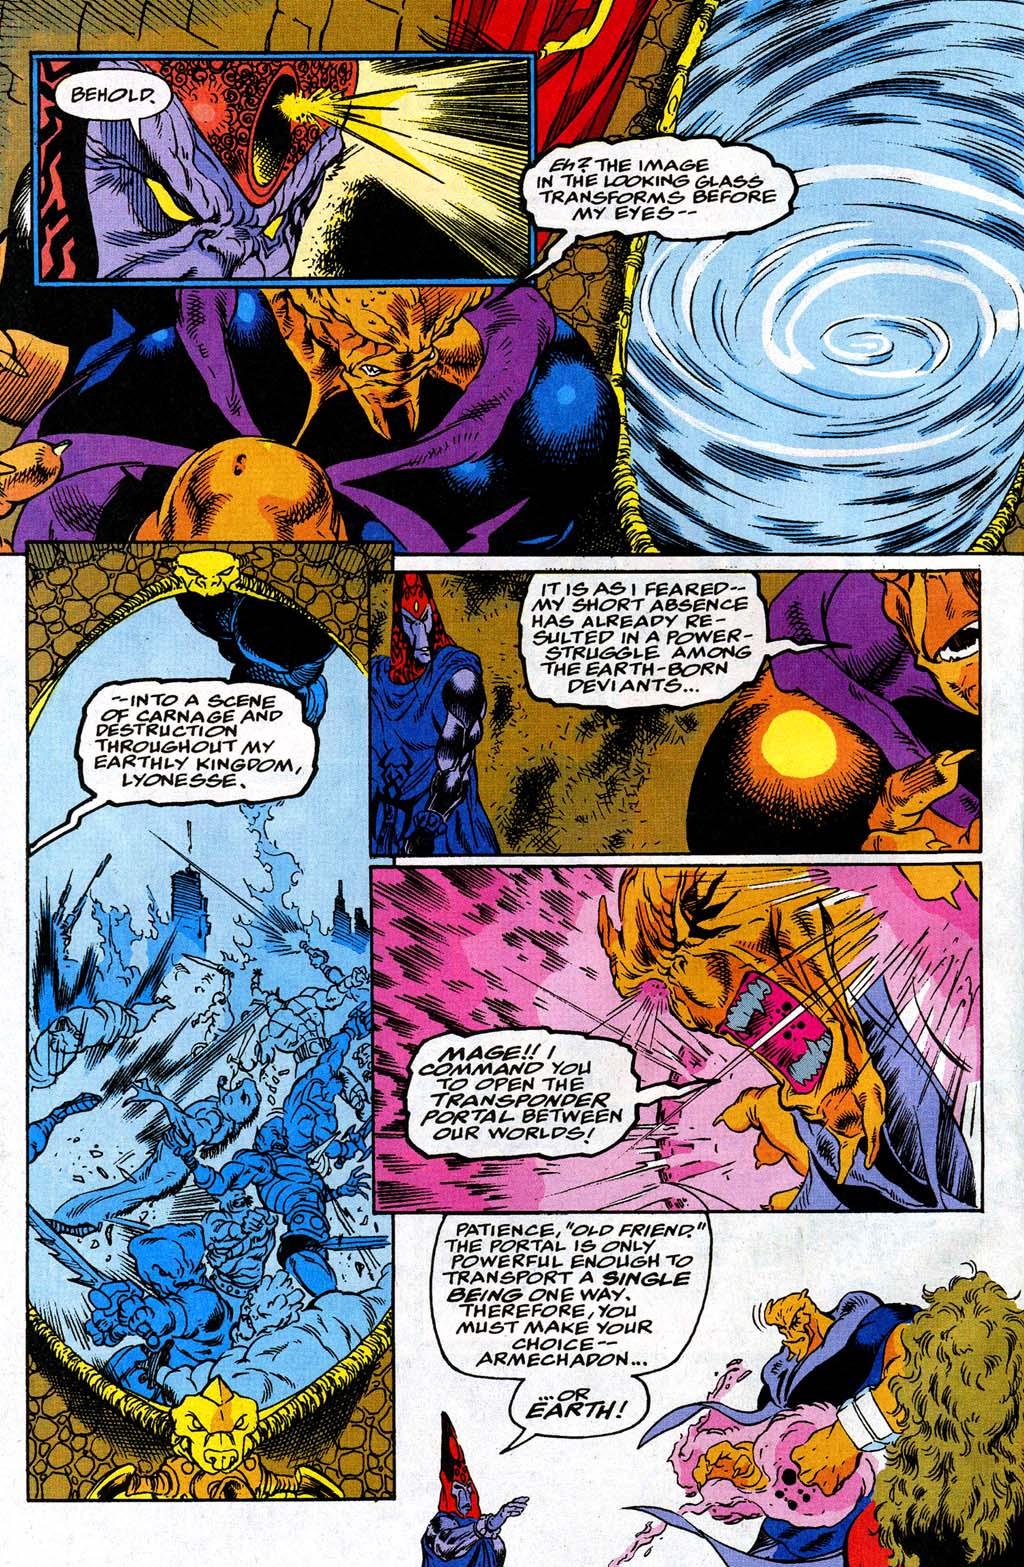 Read online Blackwulf comic -  Issue #9 - 5